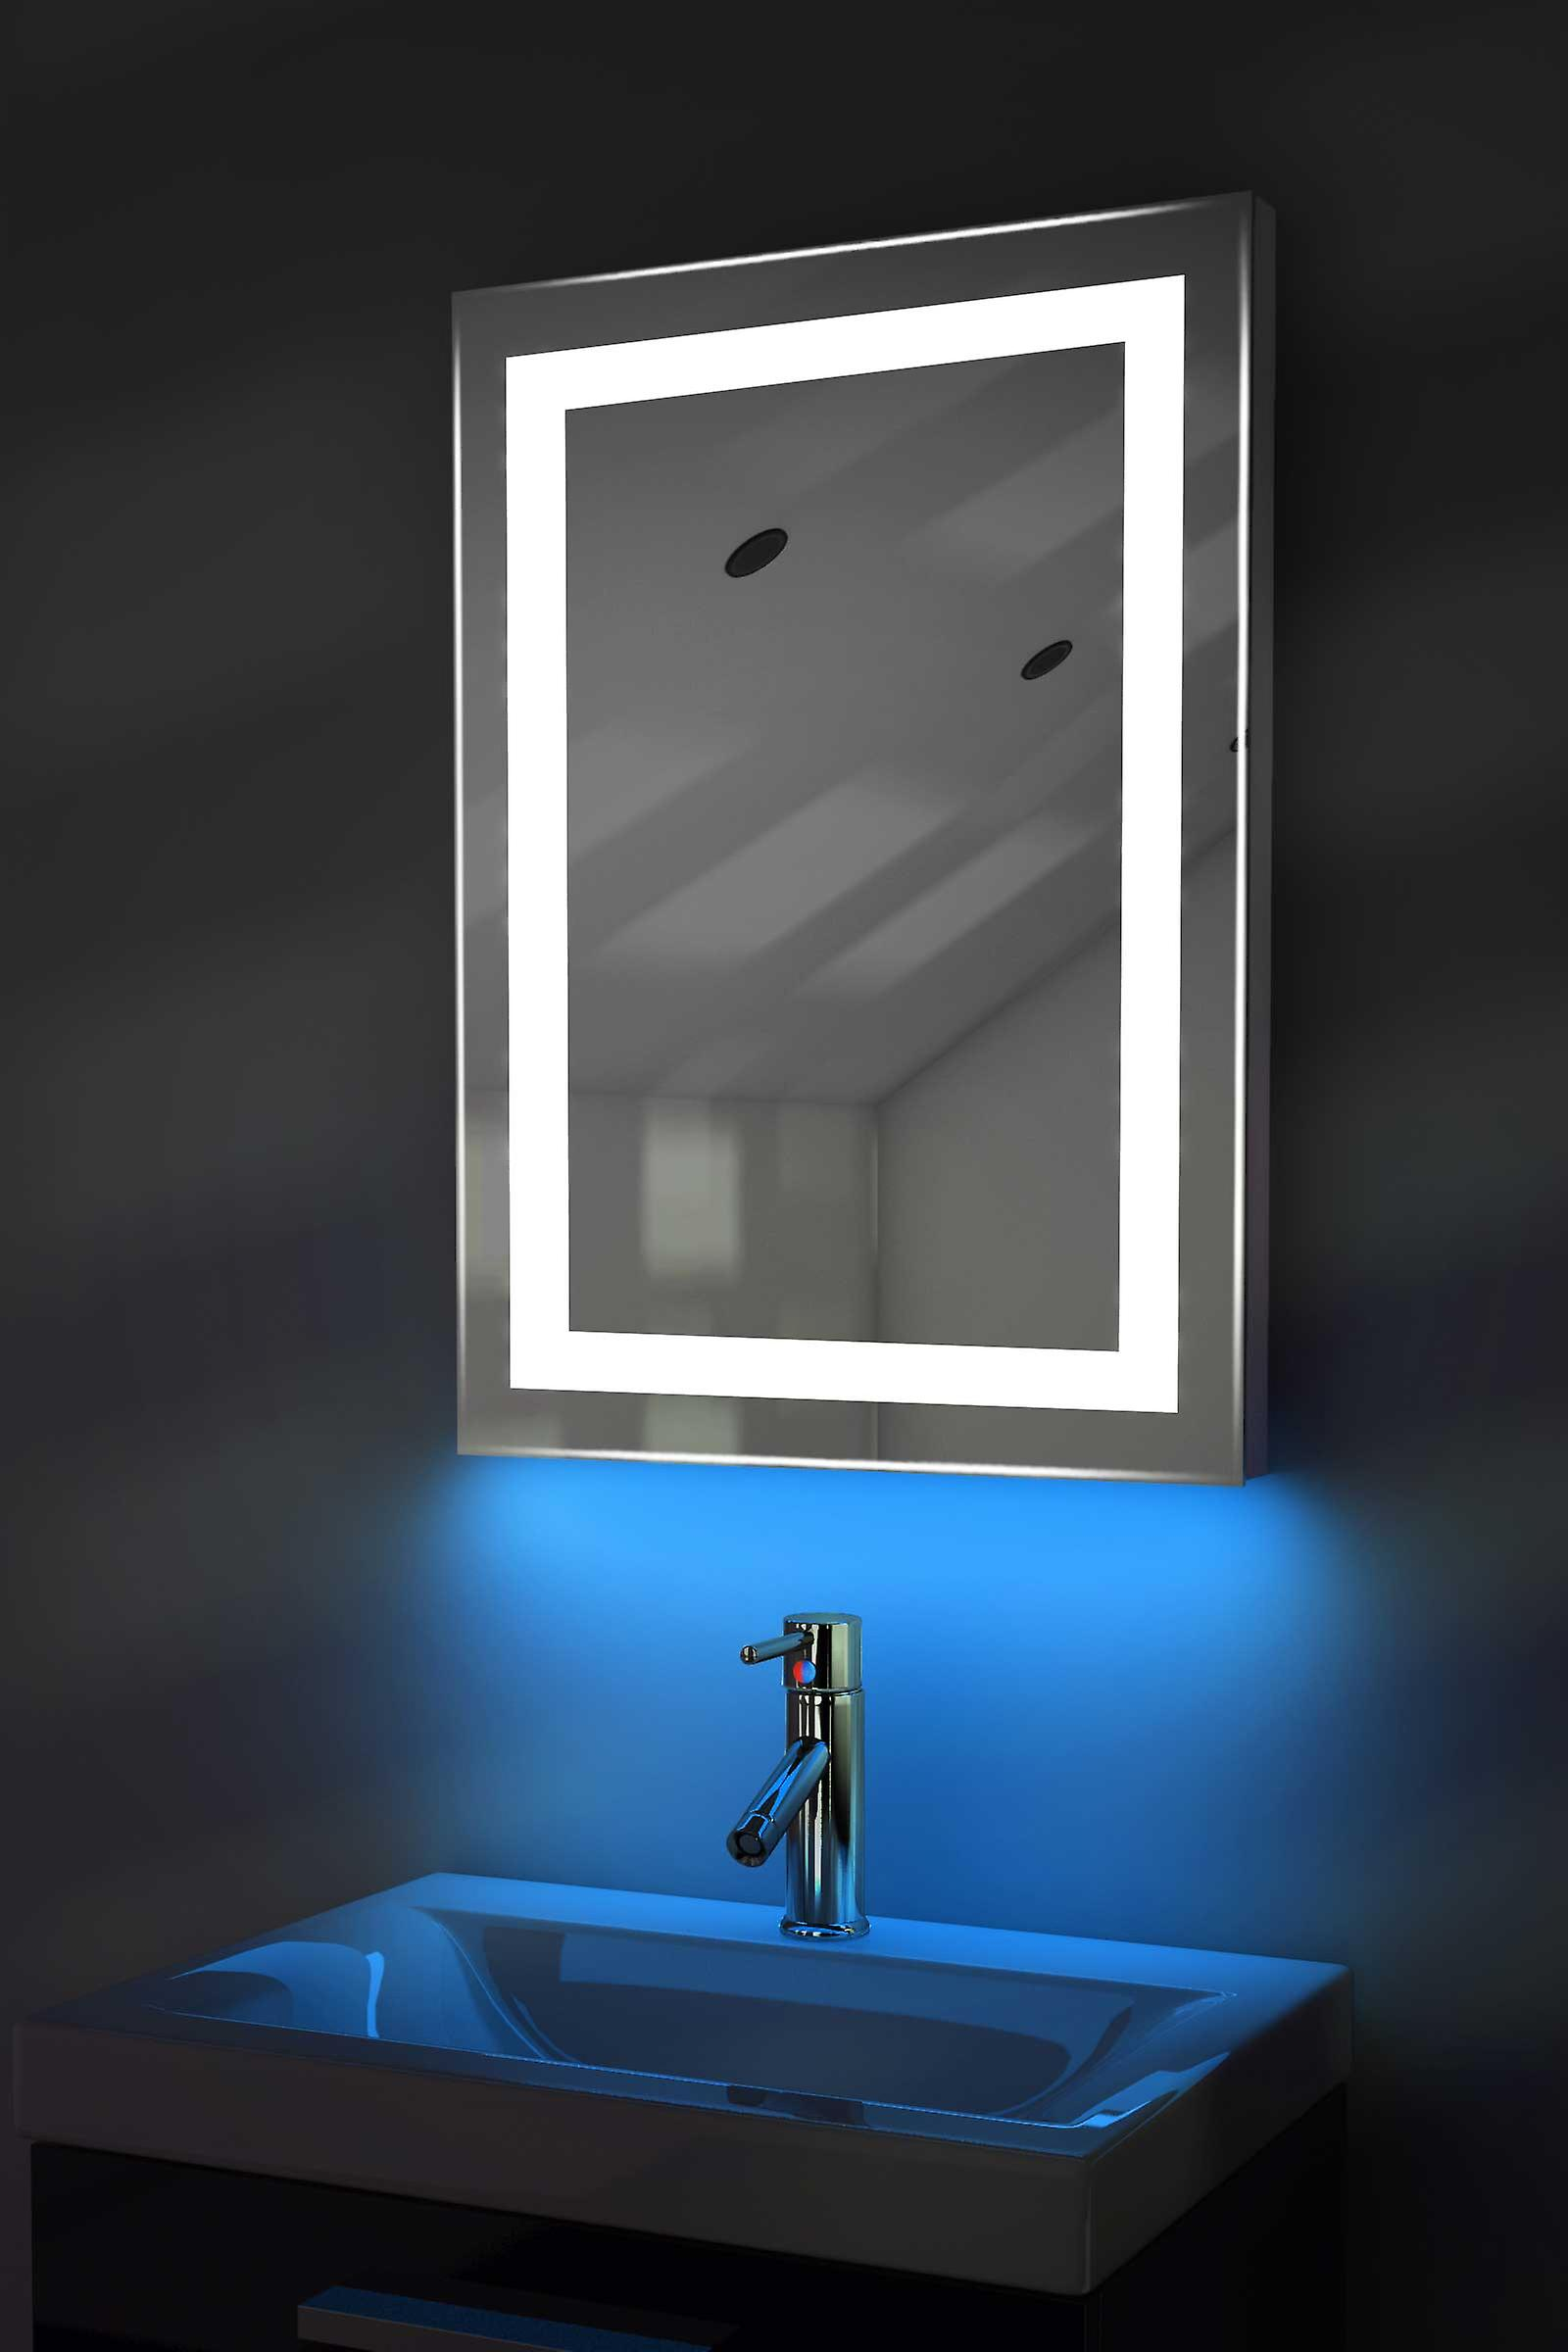 Auto Colour Change RGB LED Mirror With Demister & Sensor K160irgb